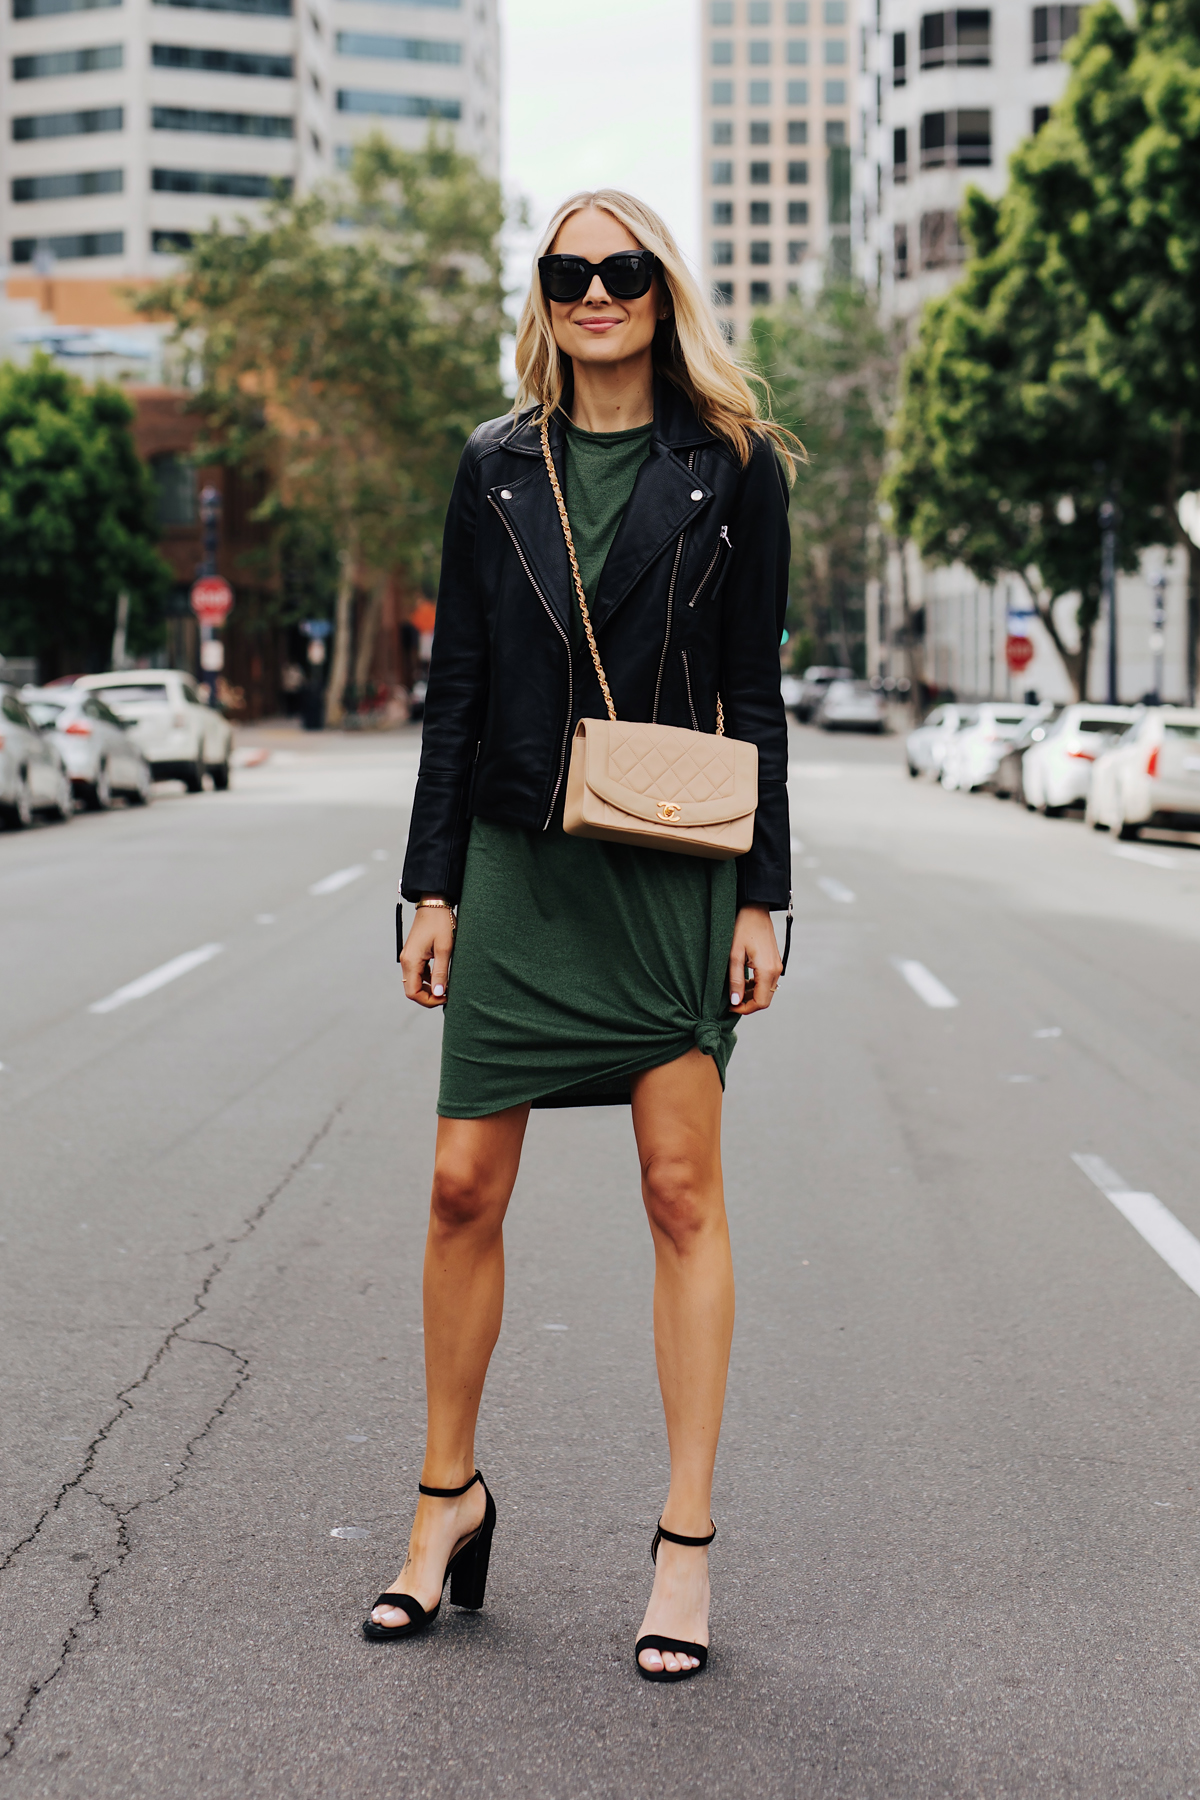 280d21810b6f Blonde Woman Wearing Green Tshirt Dress Black Leather Jacket Black Heeled  Sandals Chanel Beige Crossbody Fashion